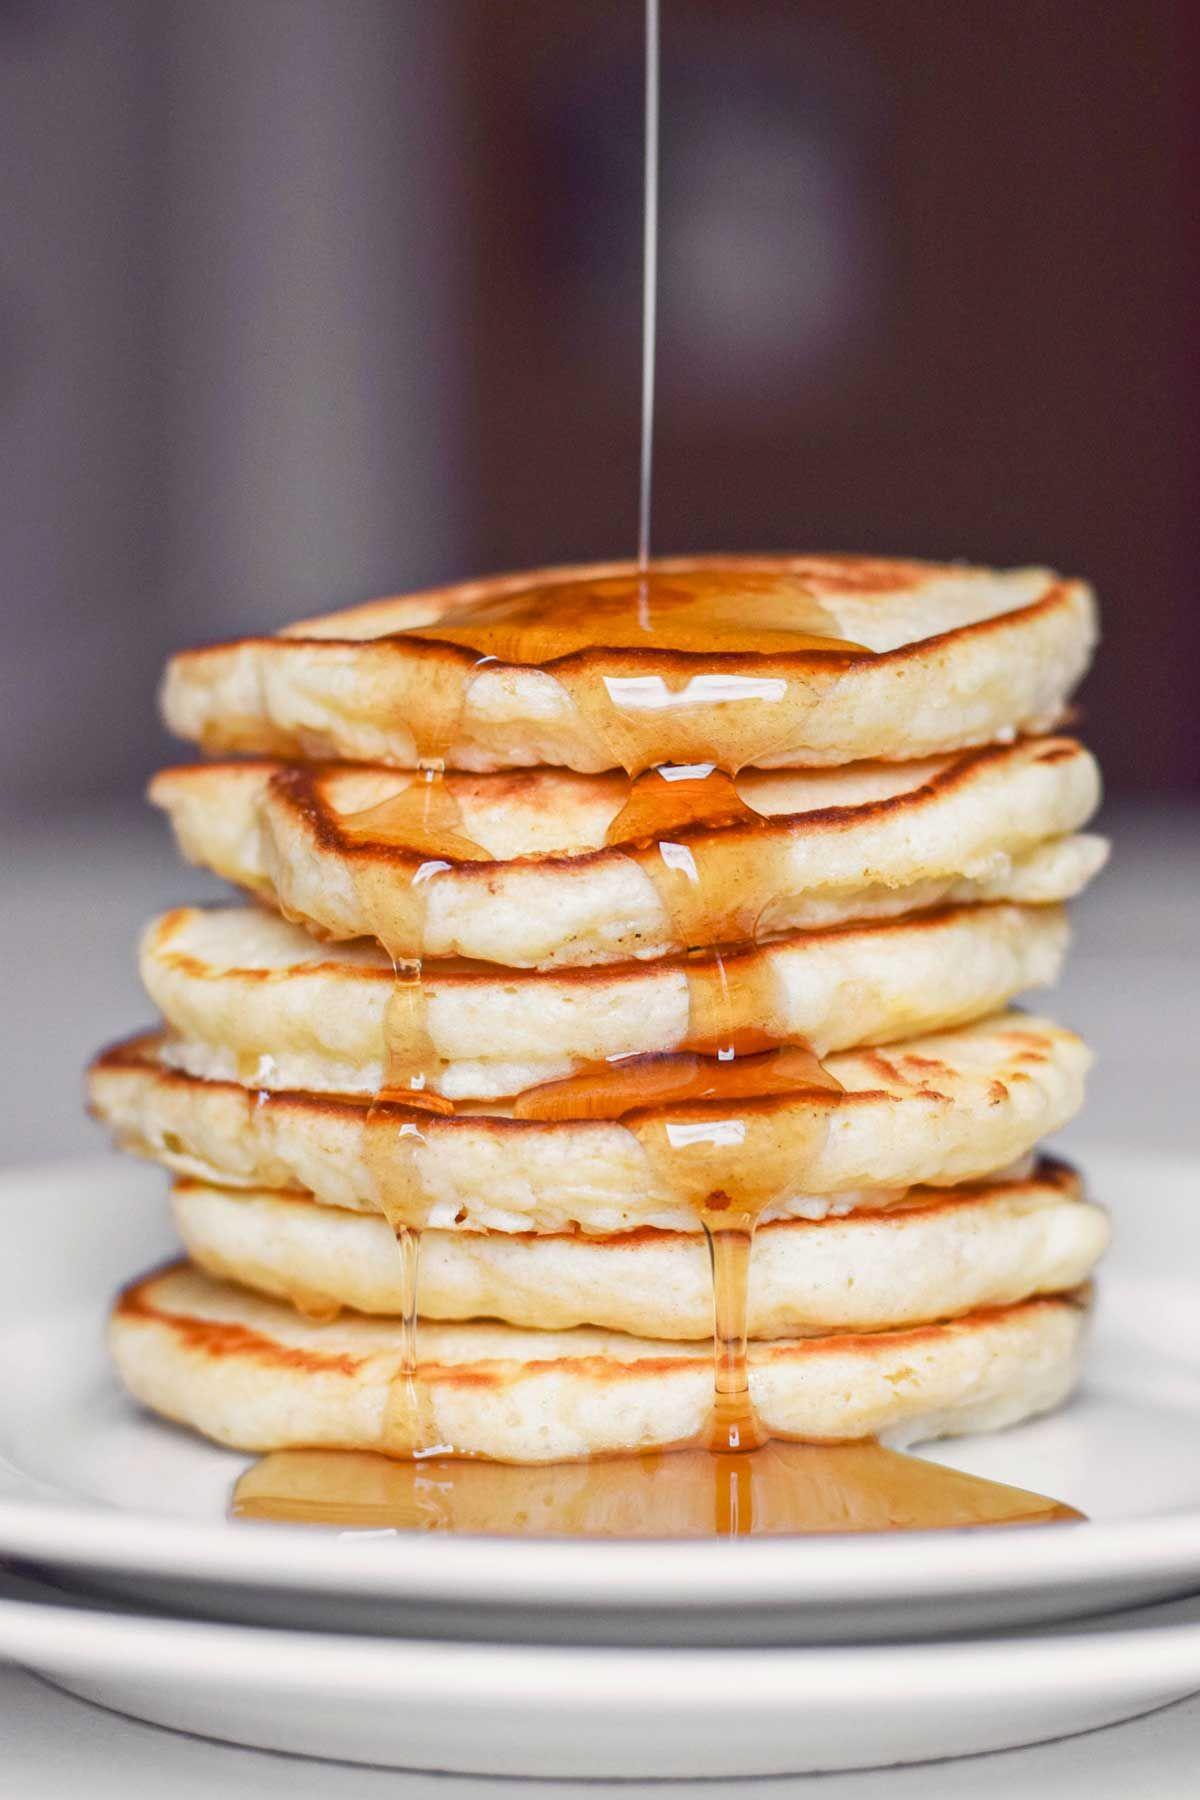 cb9e1153a916be7baad80376e7003bcc - Ricette Dei Pancake